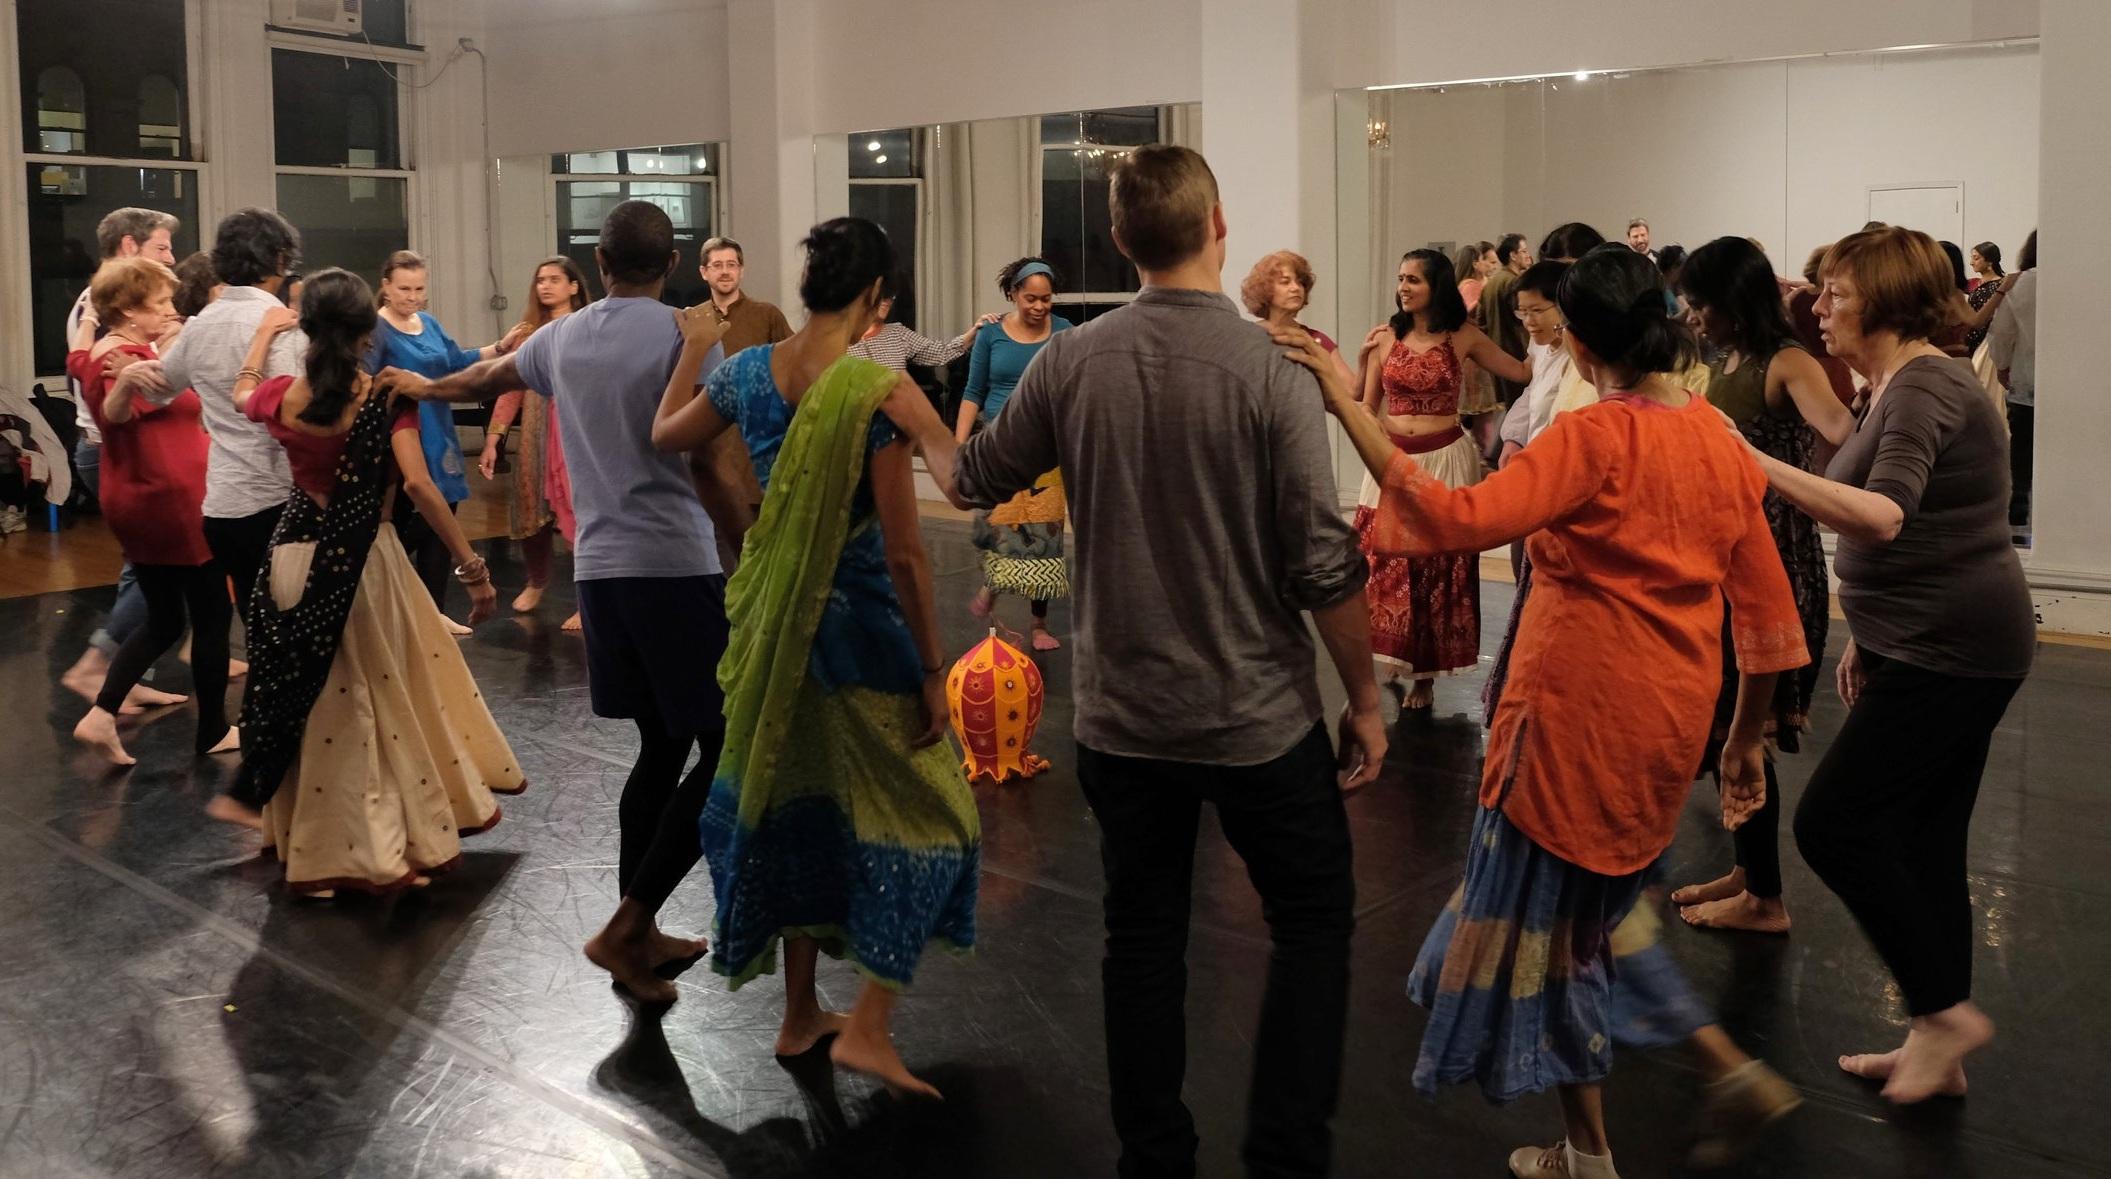 Public DITR Workshop, Gibney Dance Center, New York, NY. Photo by Sanjay Cherubala.